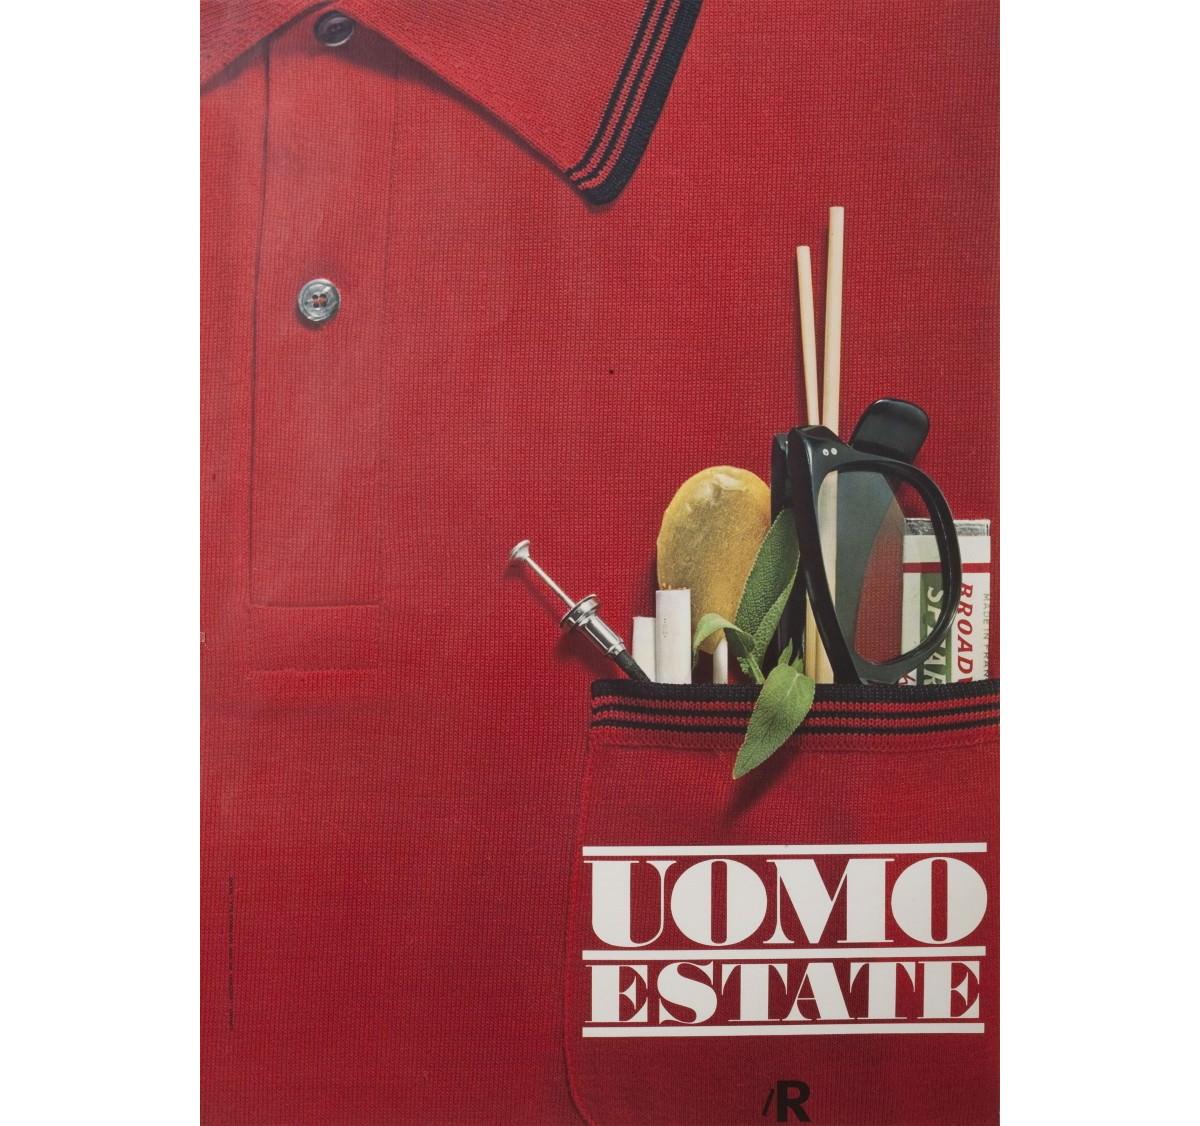 Giancarlo Iliprandi, Uomo Estate (foto Serge Libiszewski), 1964, Fondo Iliprandi, n. B007714S